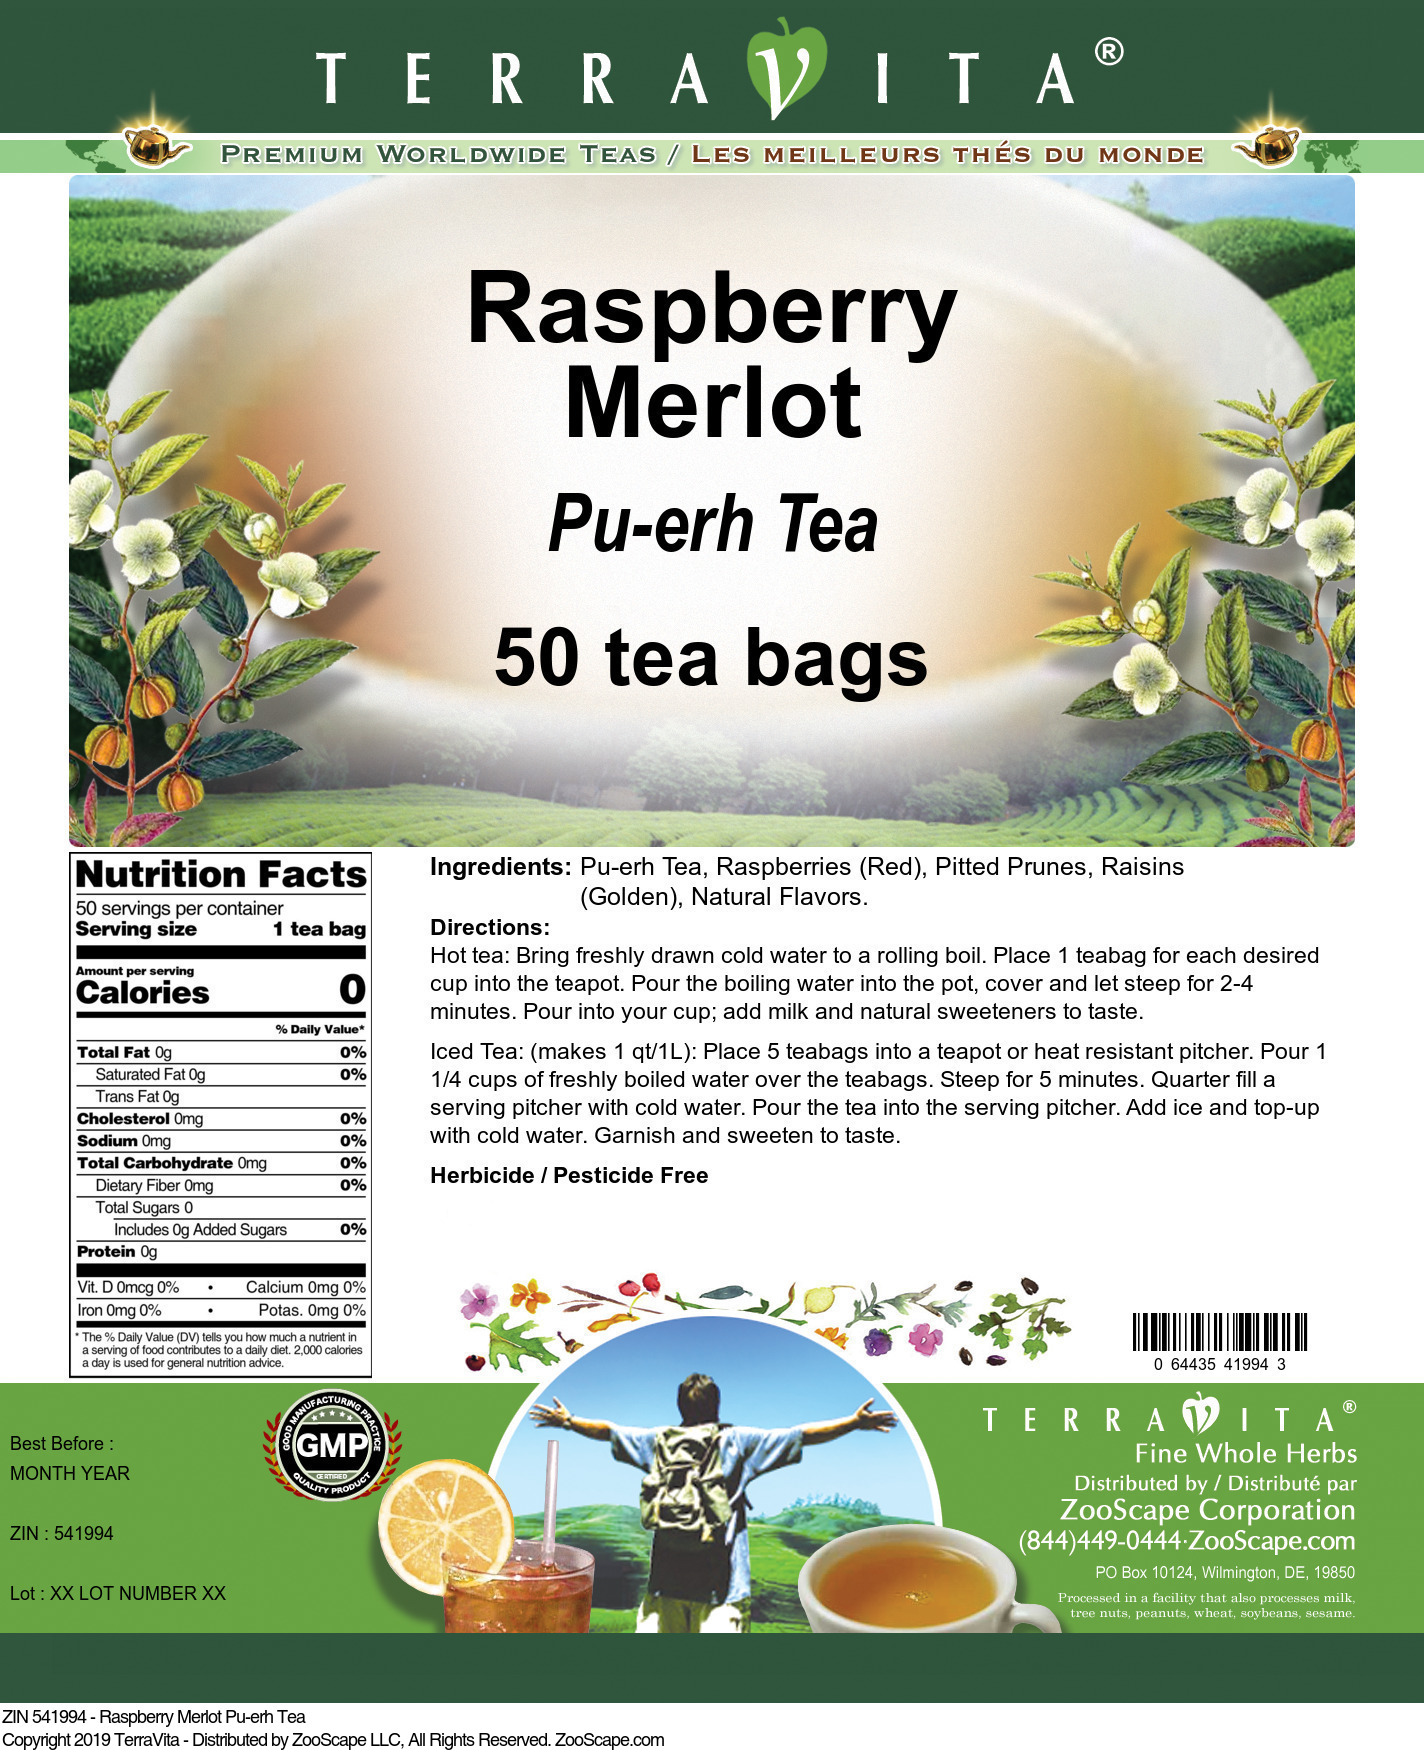 Raspberry Merlot Pu-erh Tea